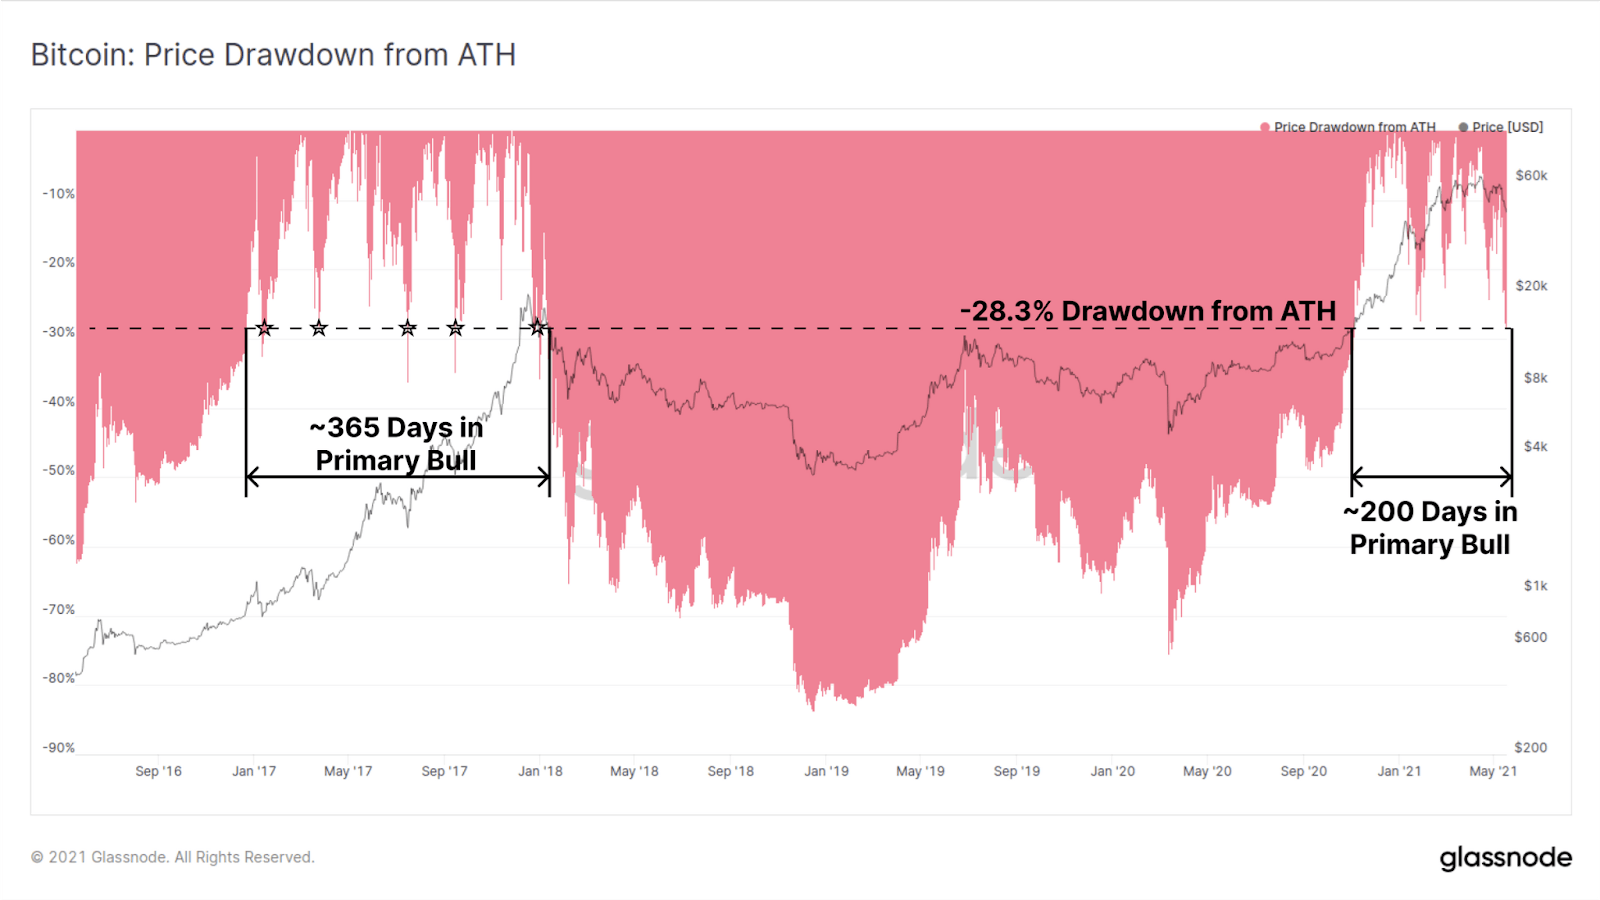 Bitcoin BTC Price Drawdown from ATH